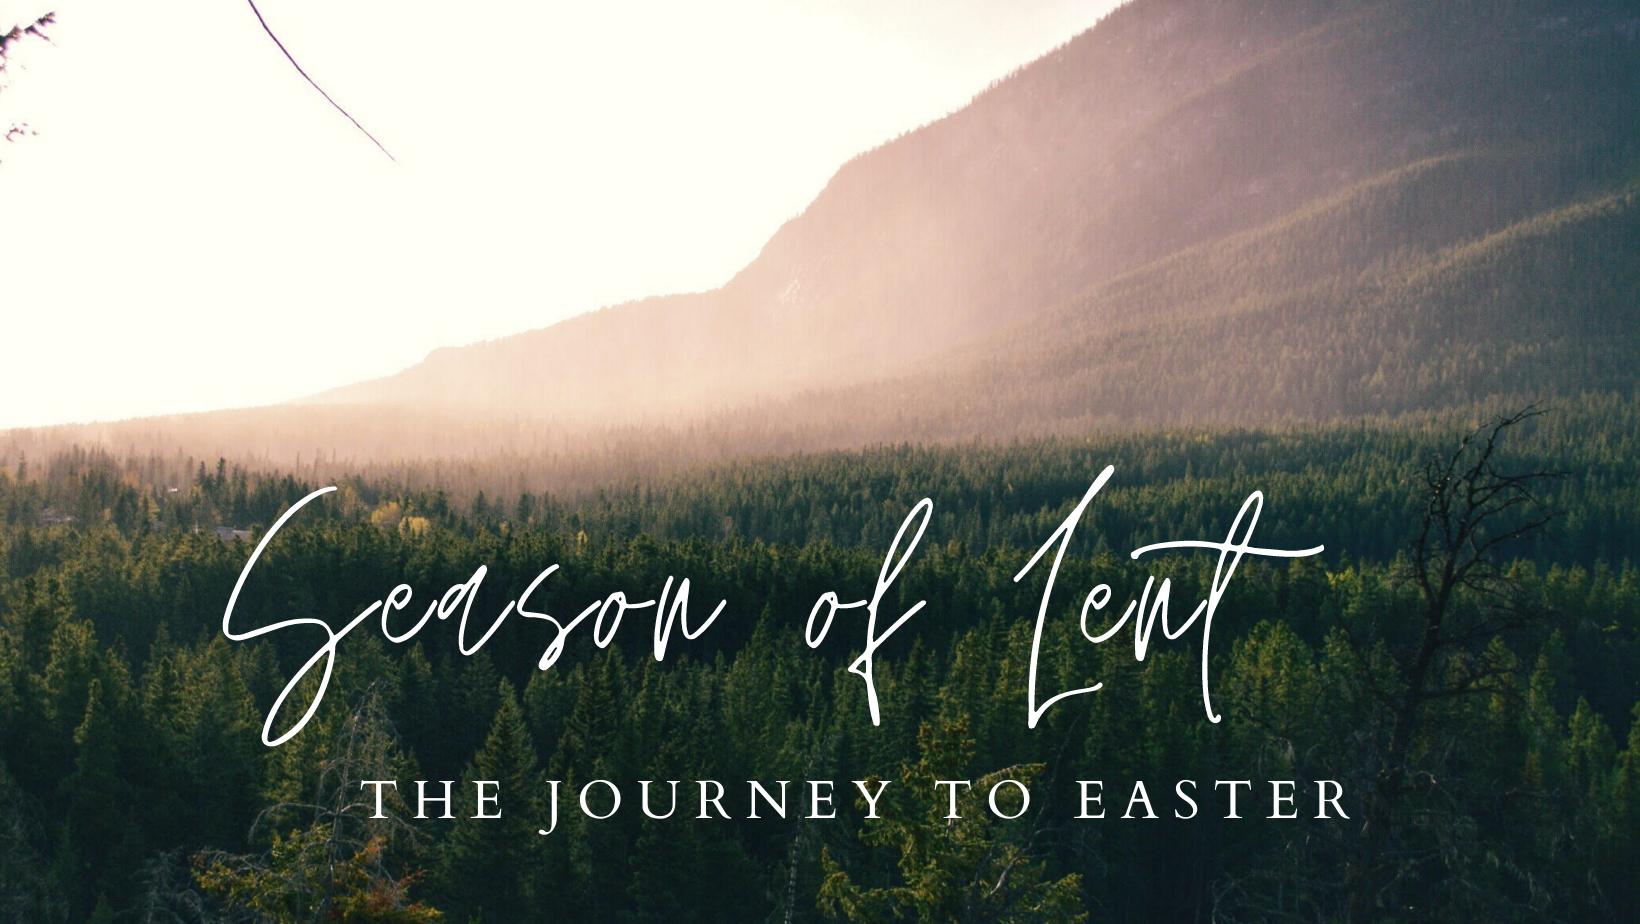 40 Days of Lent Bible Reading Plan